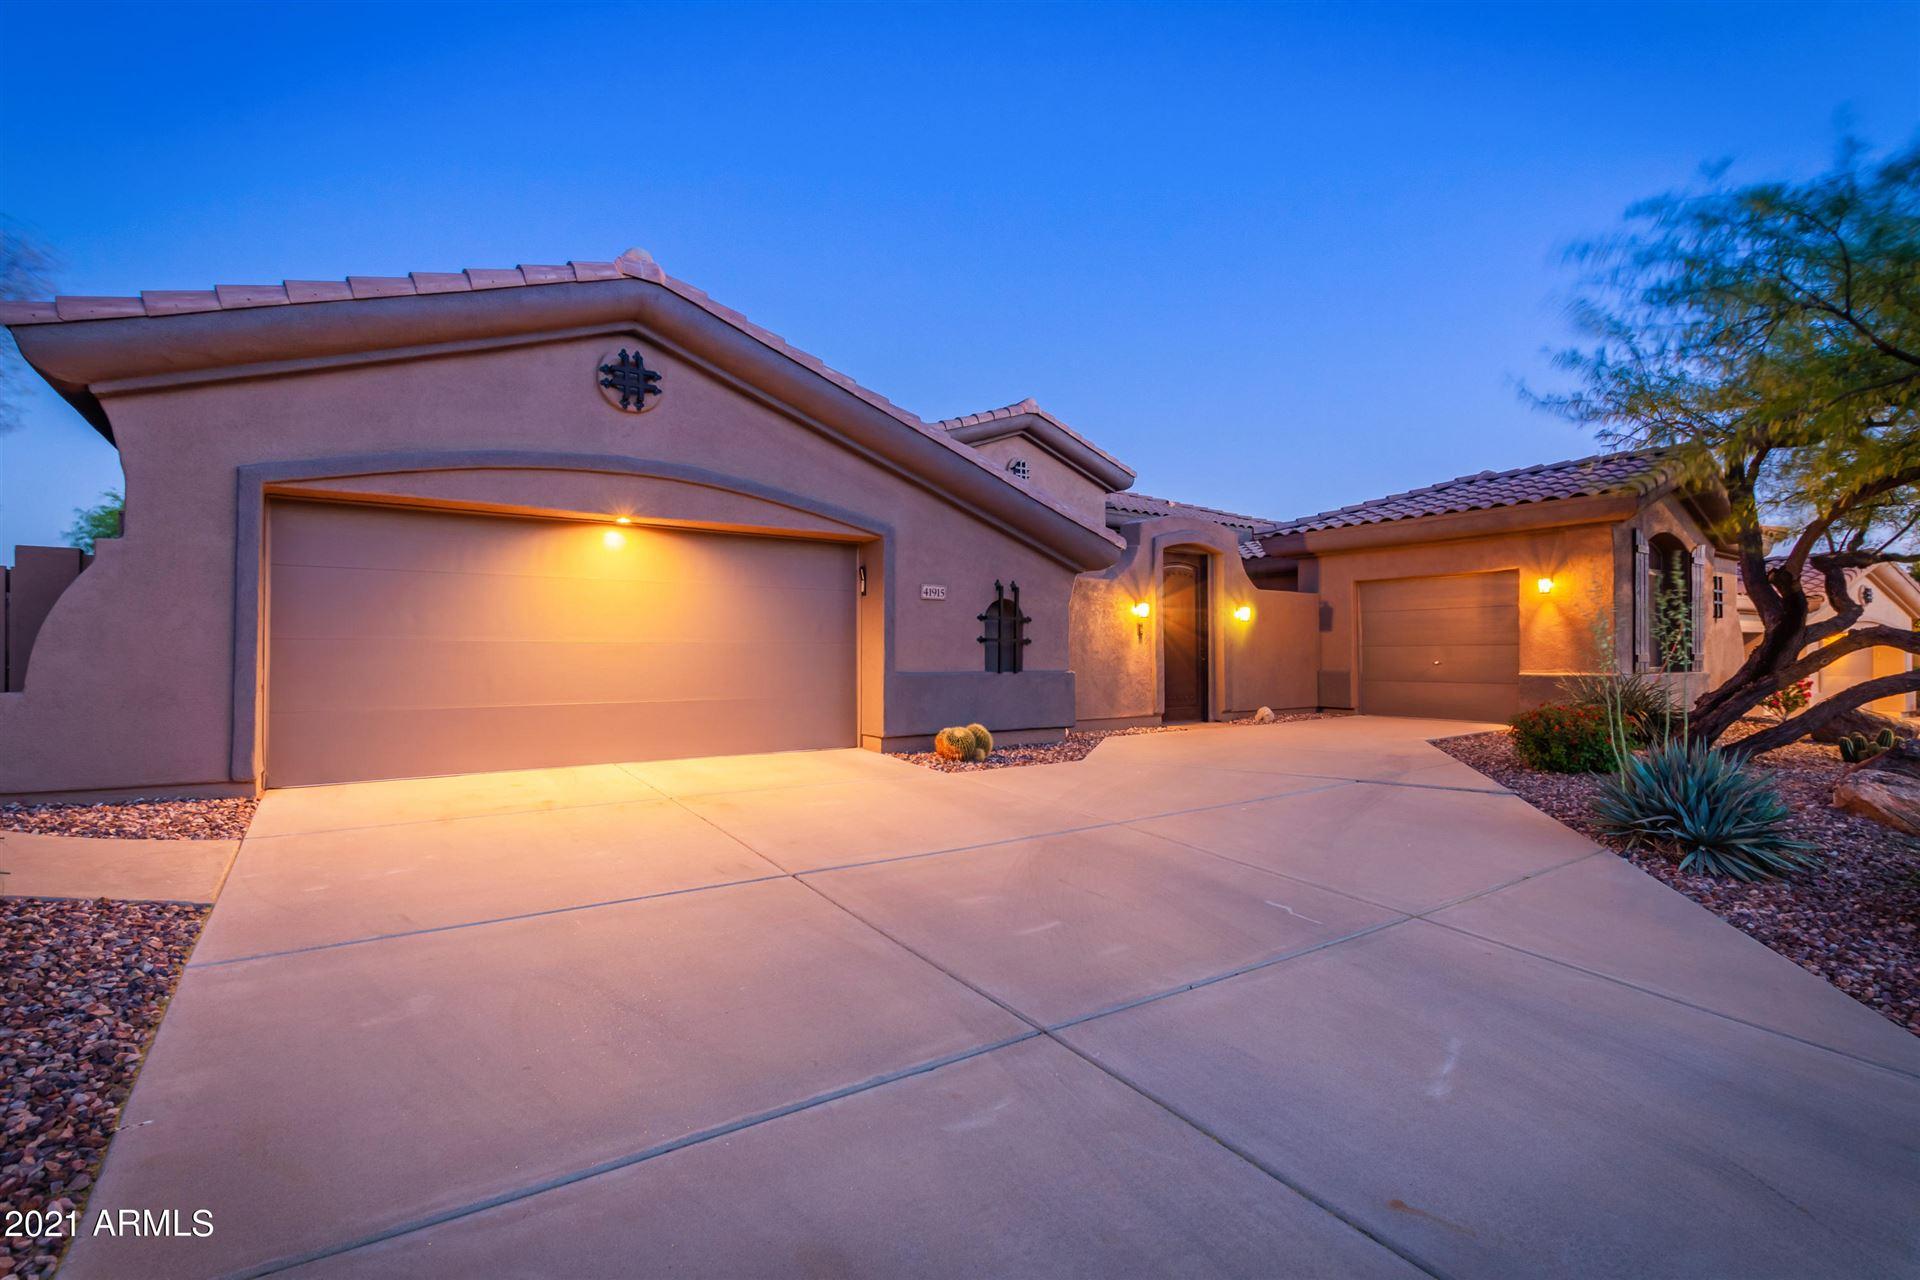 Photo of 41915 N GOLF CREST Road, Anthem, AZ 85086 (MLS # 6226087)